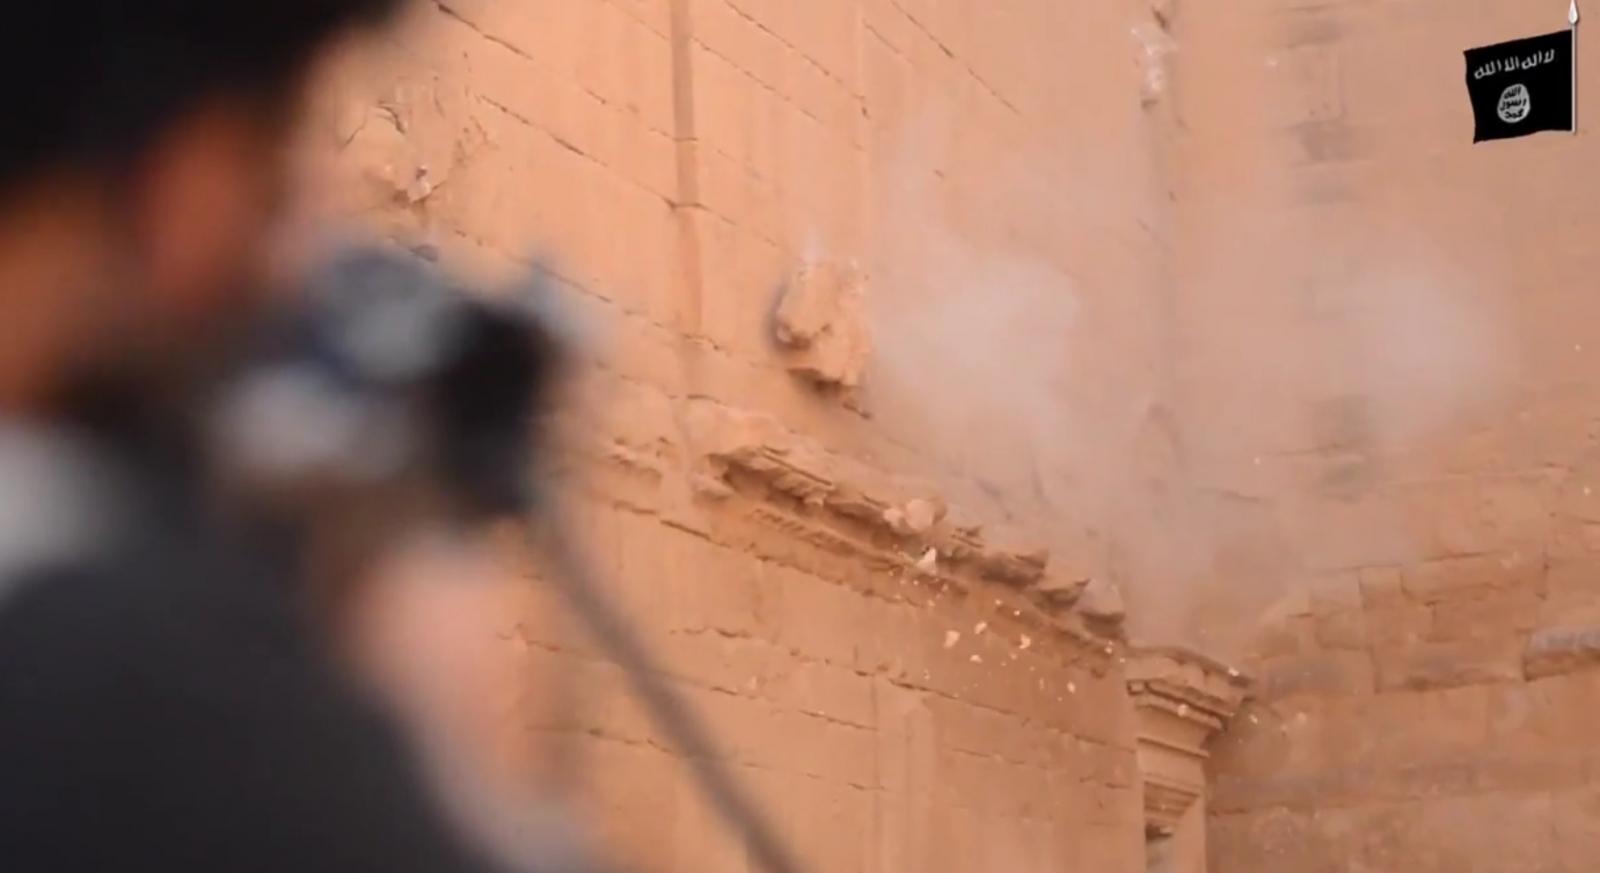 ISIS destroys Hatra Unesco Iraq artefacts